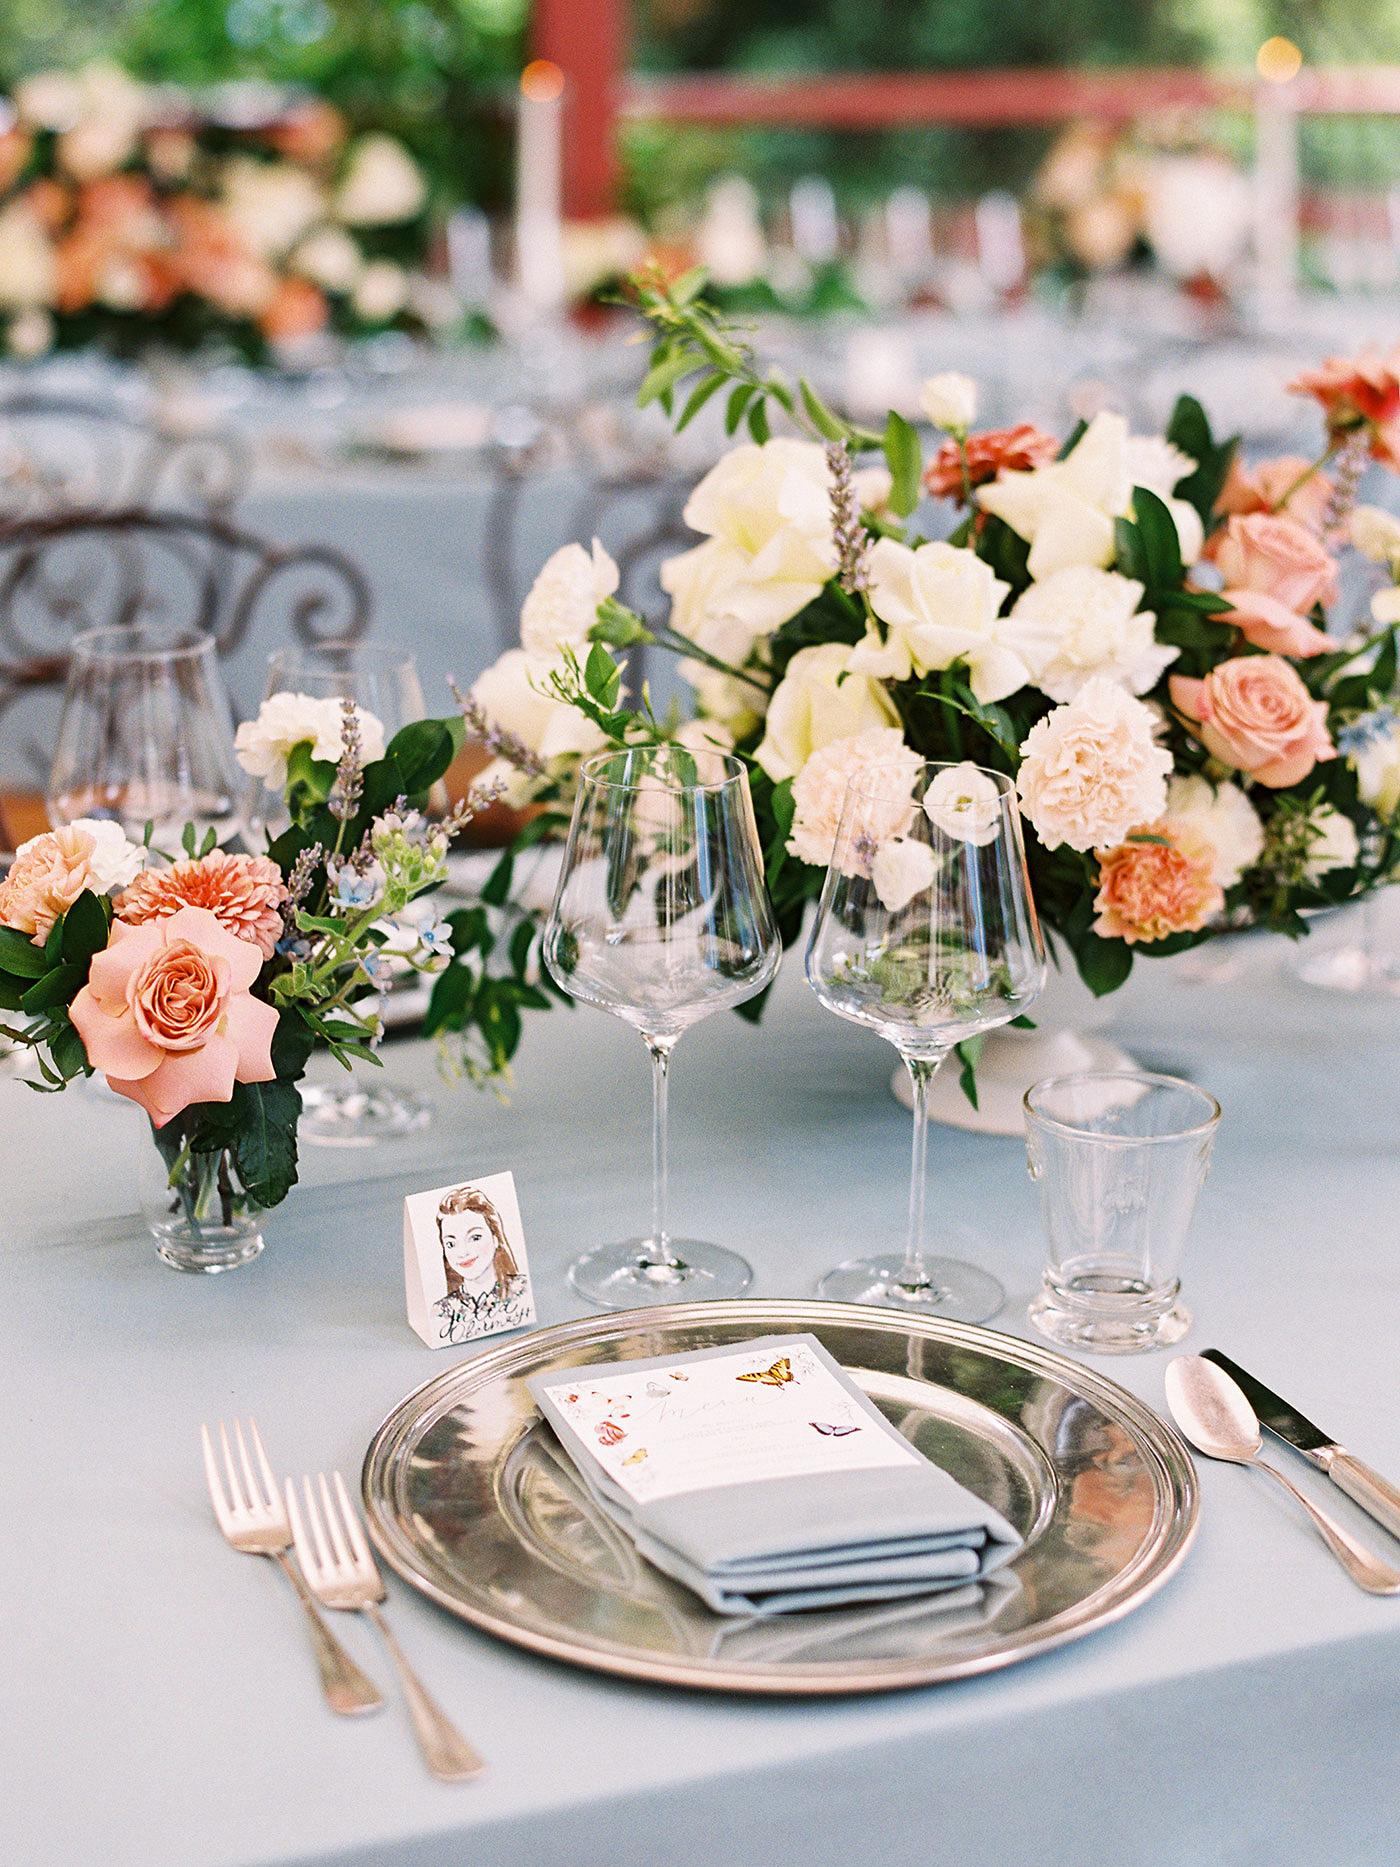 julia franz wedding reception place setting